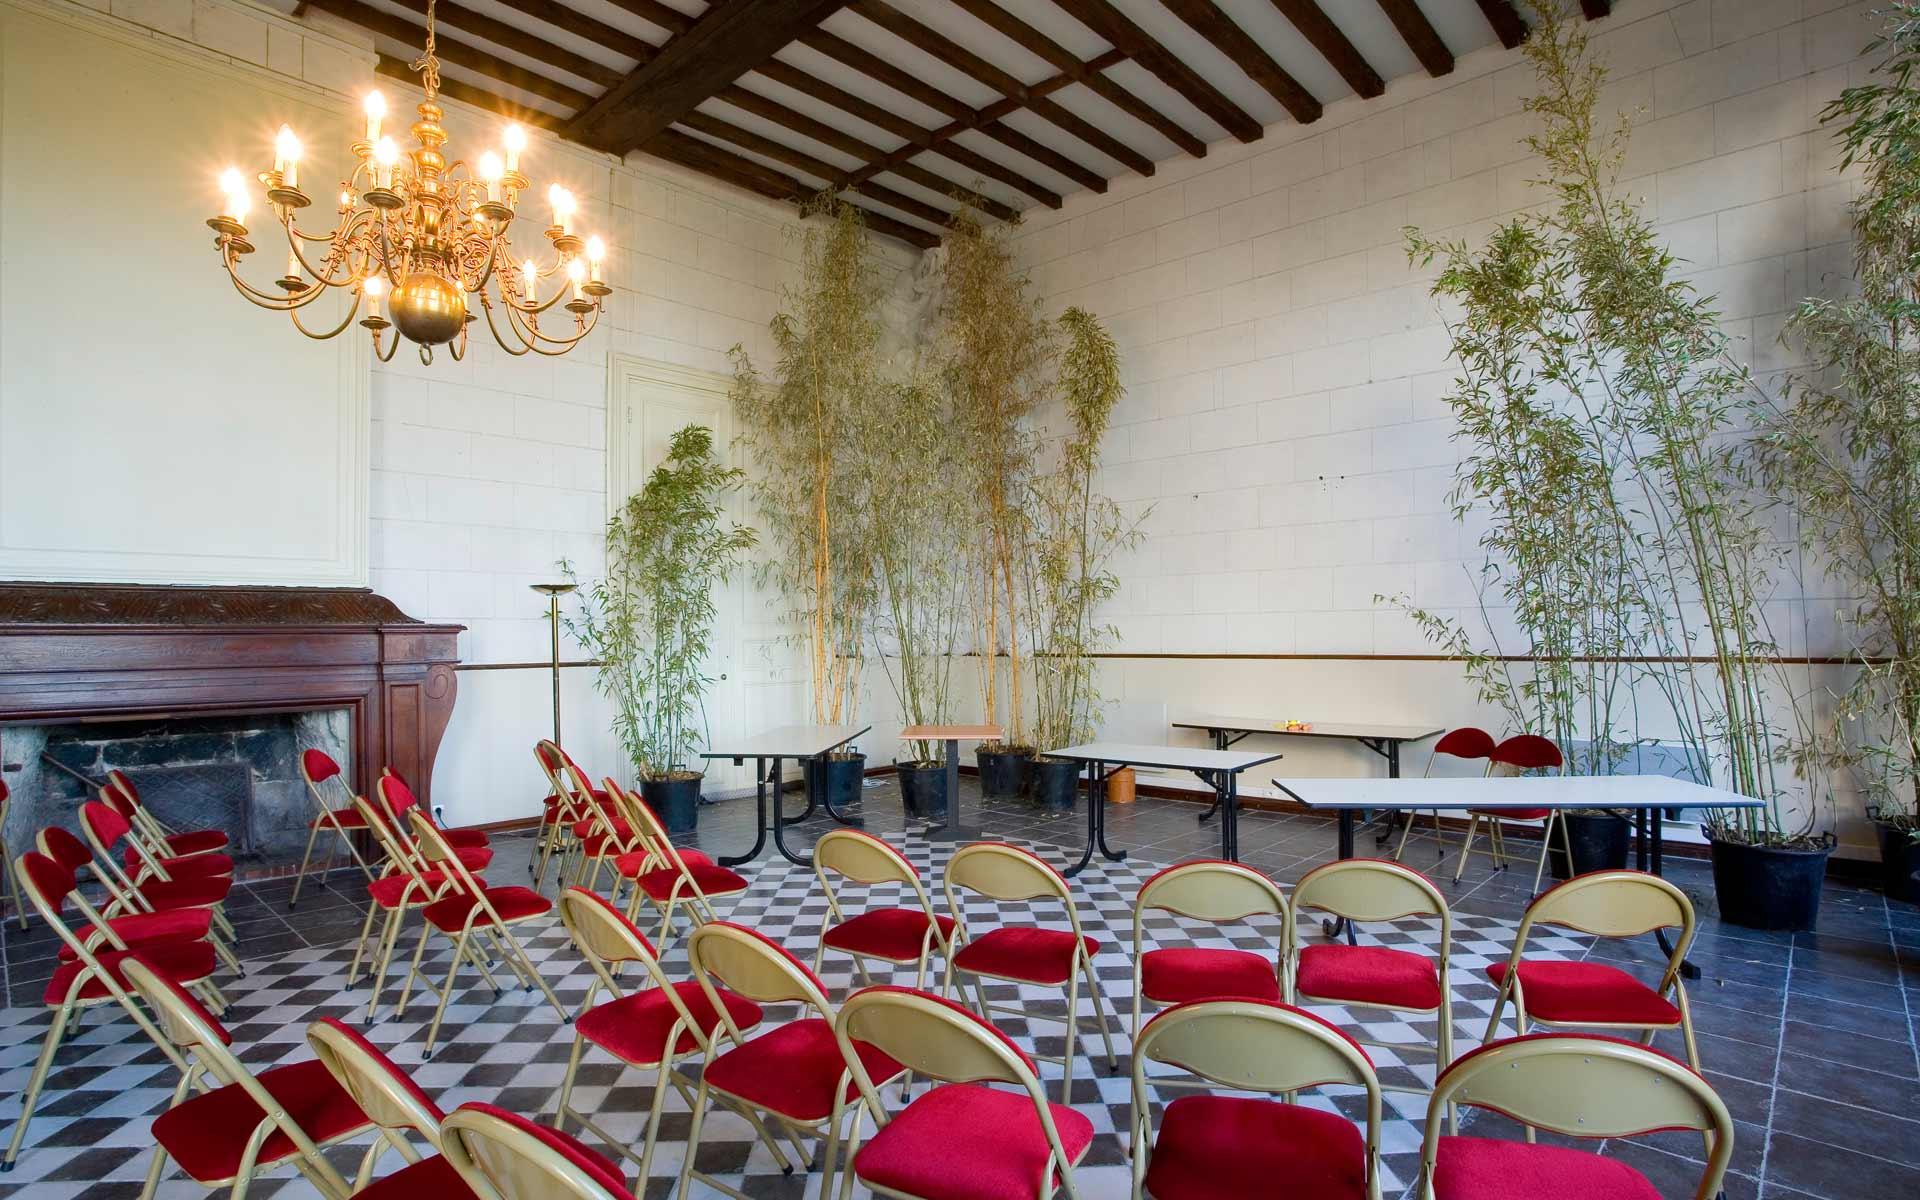 seminaire-chateau-7-tours-salle-credit-2019